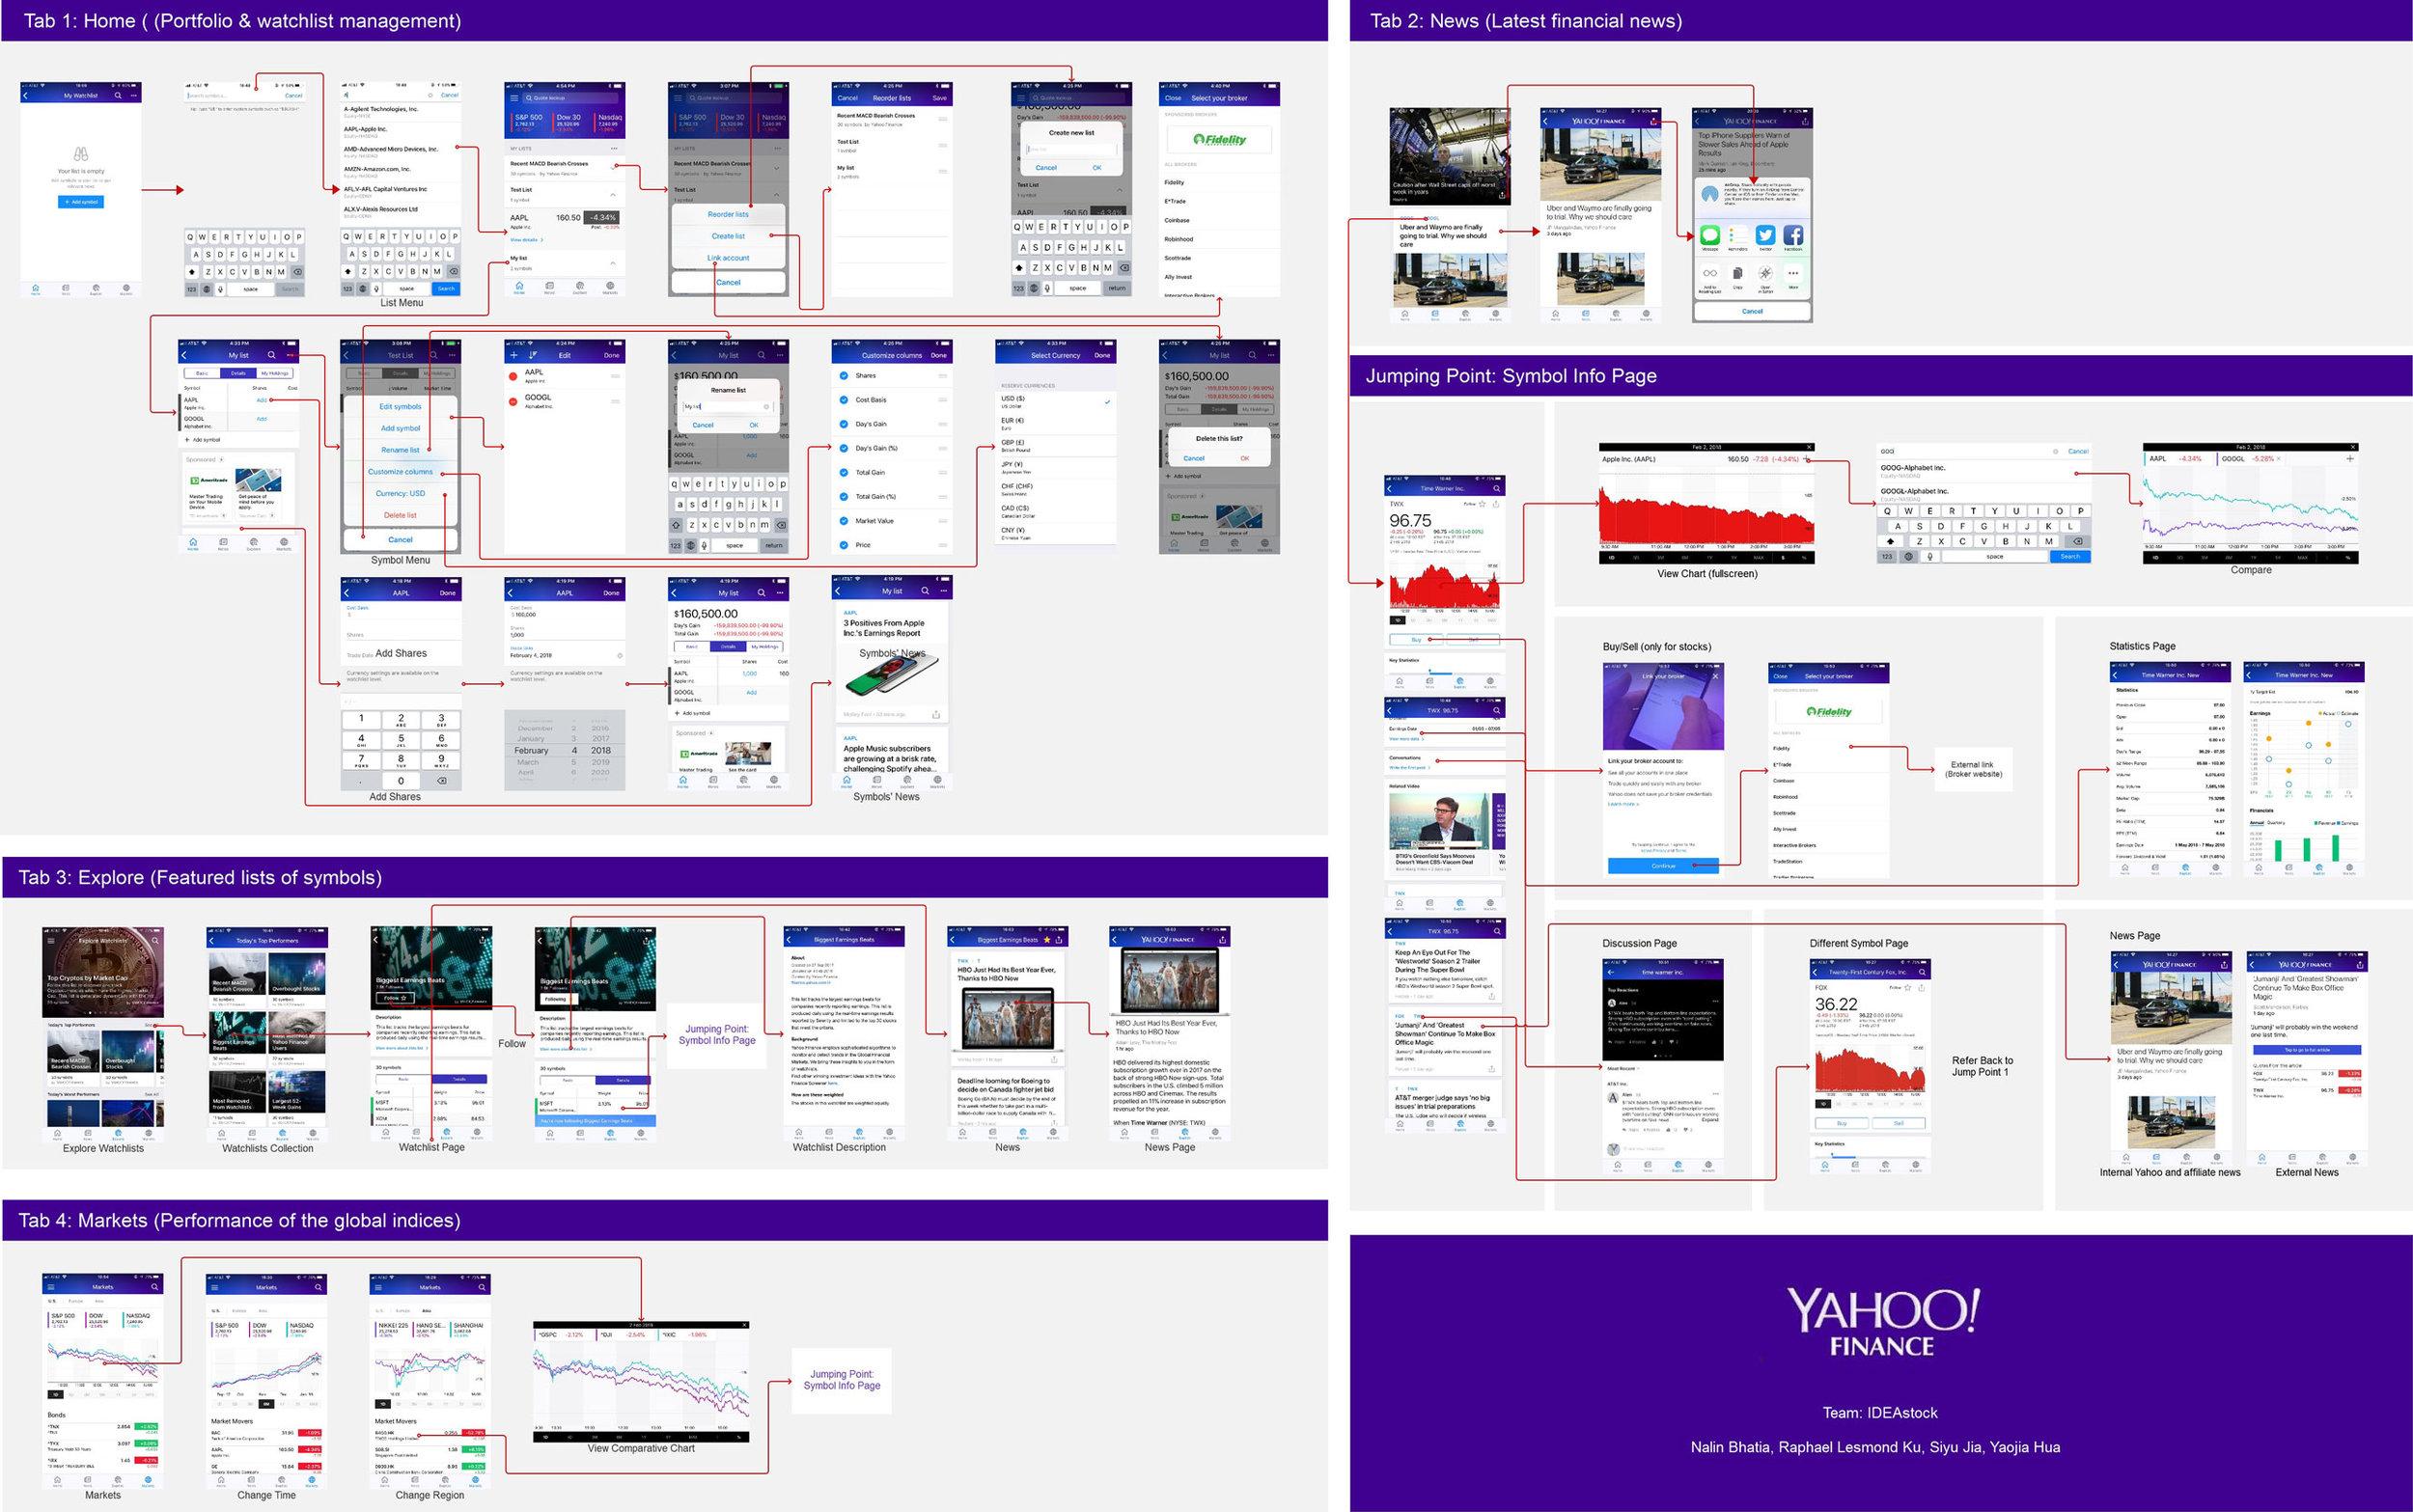 Yahoo Stock Symbol Colbro